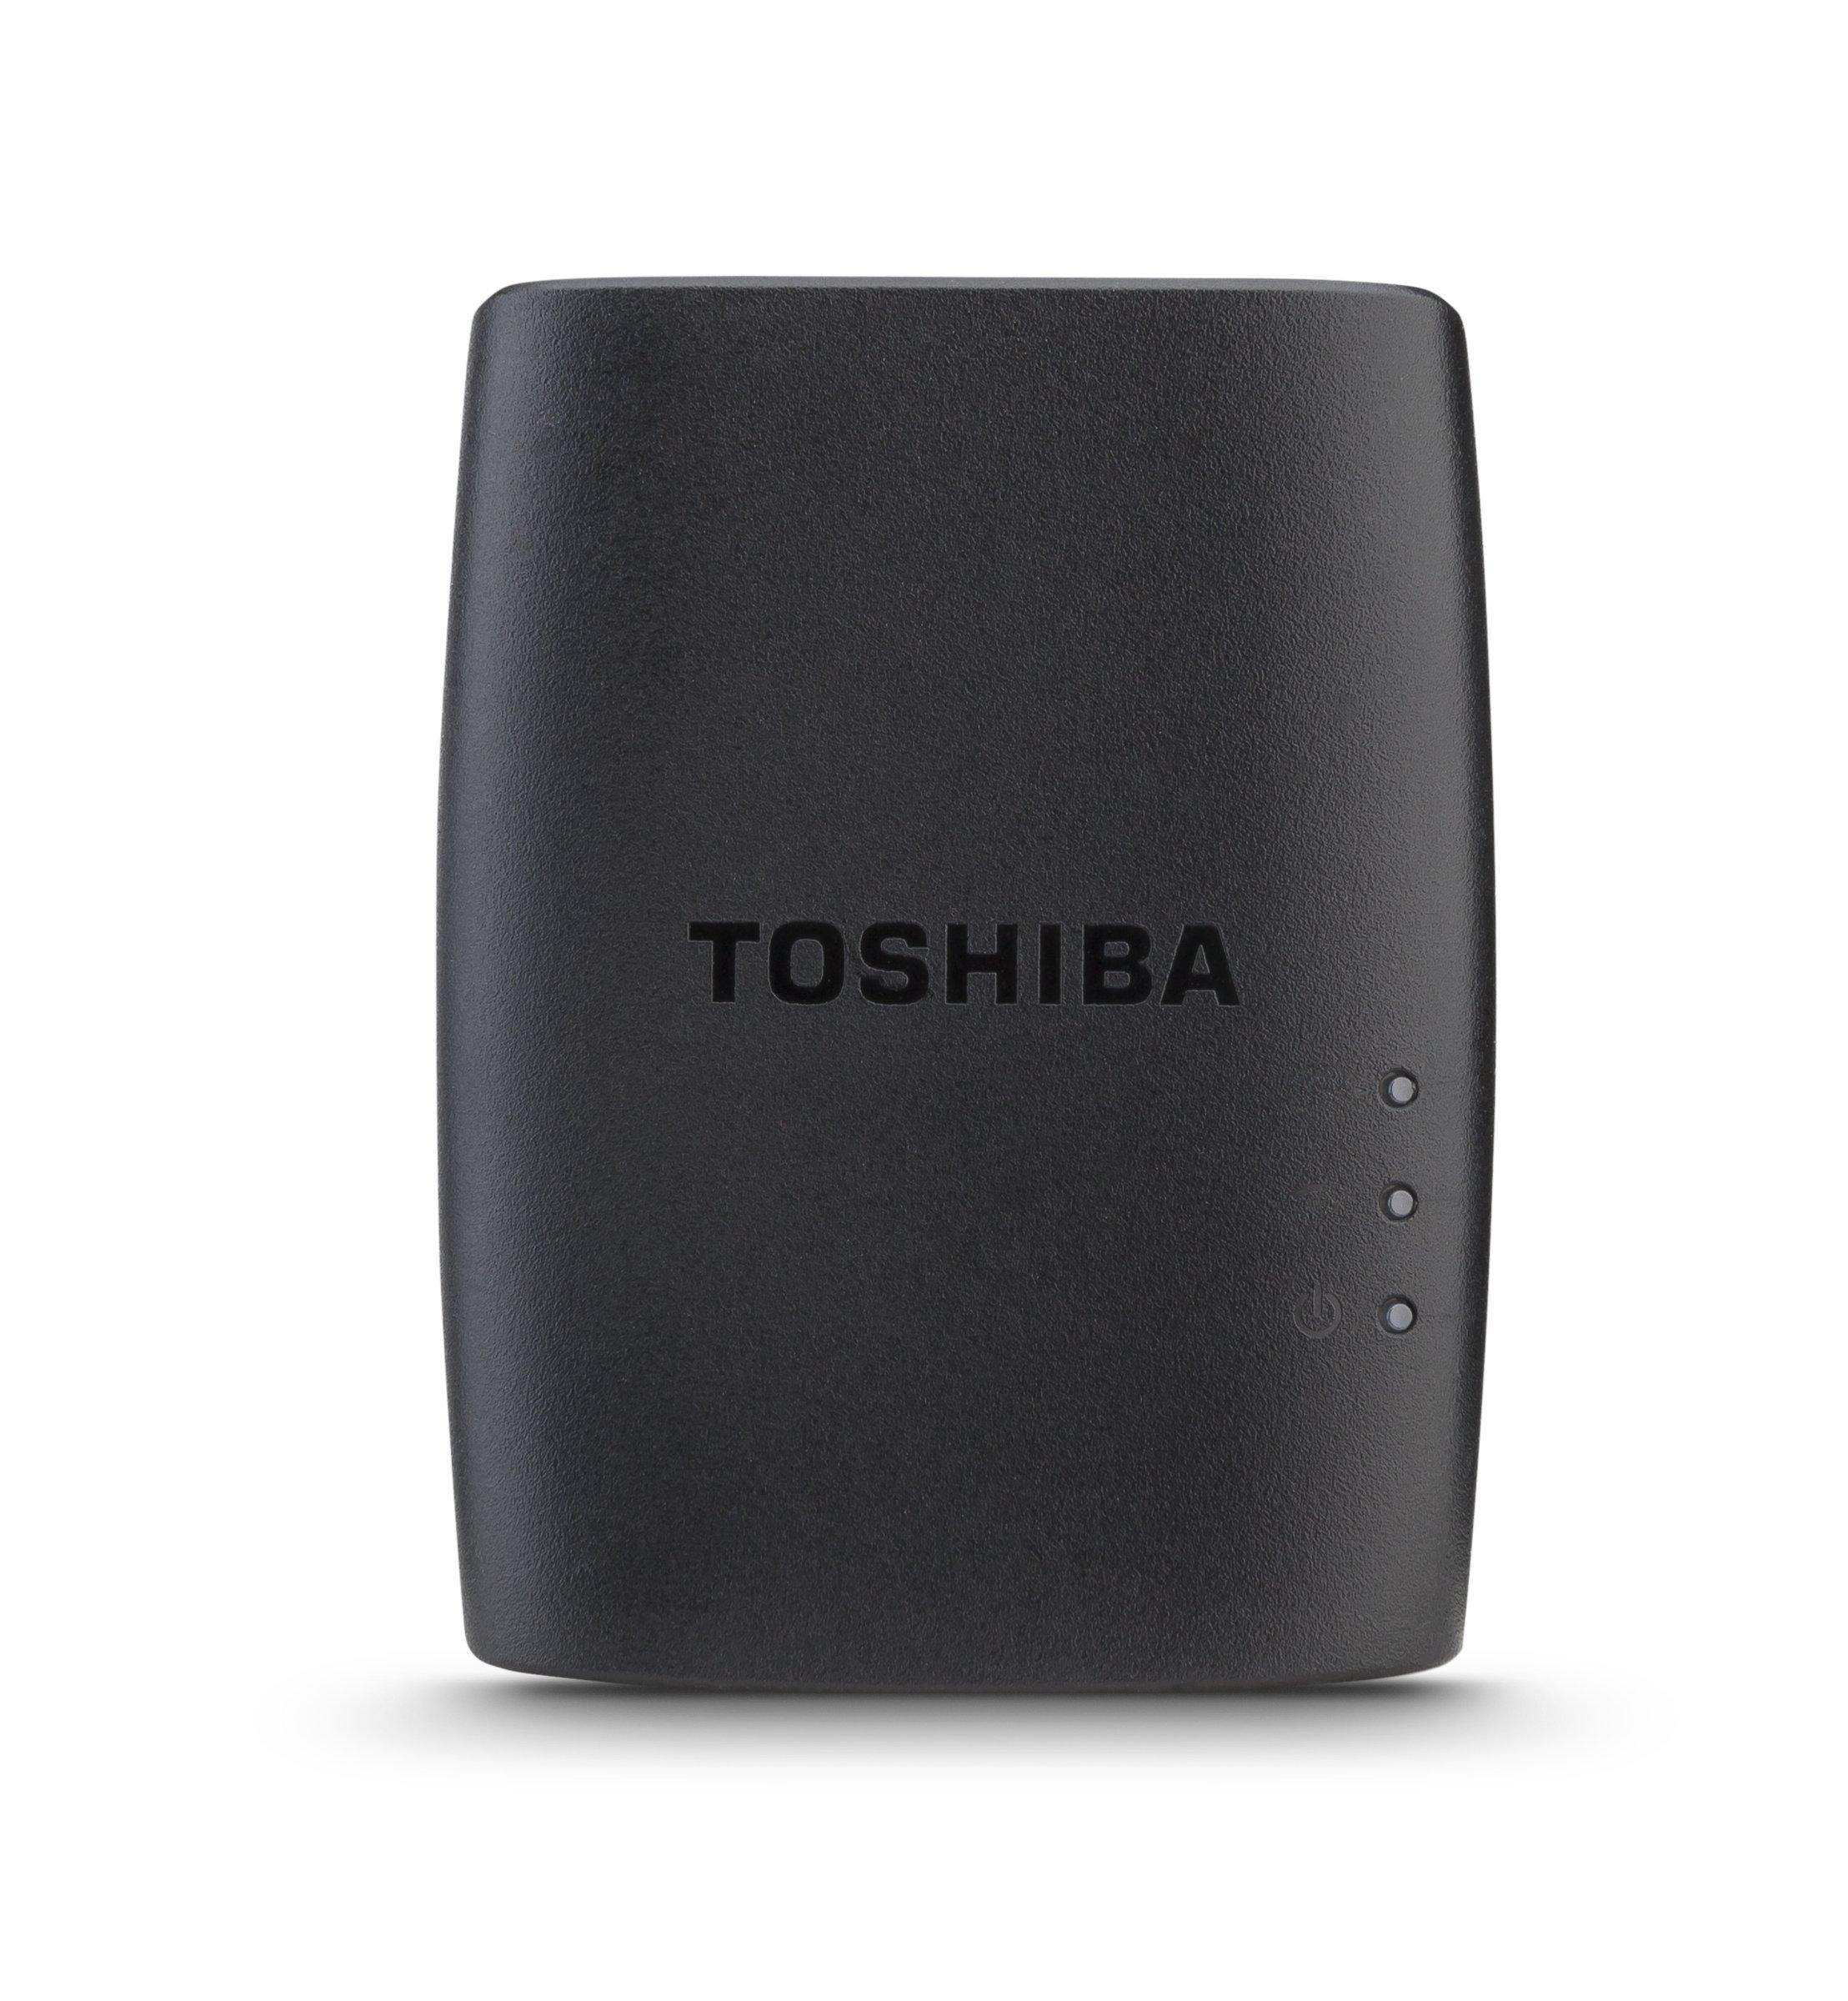 Toshiba Canvio Cast Wireless Adapter (HDWW100XKWU1)